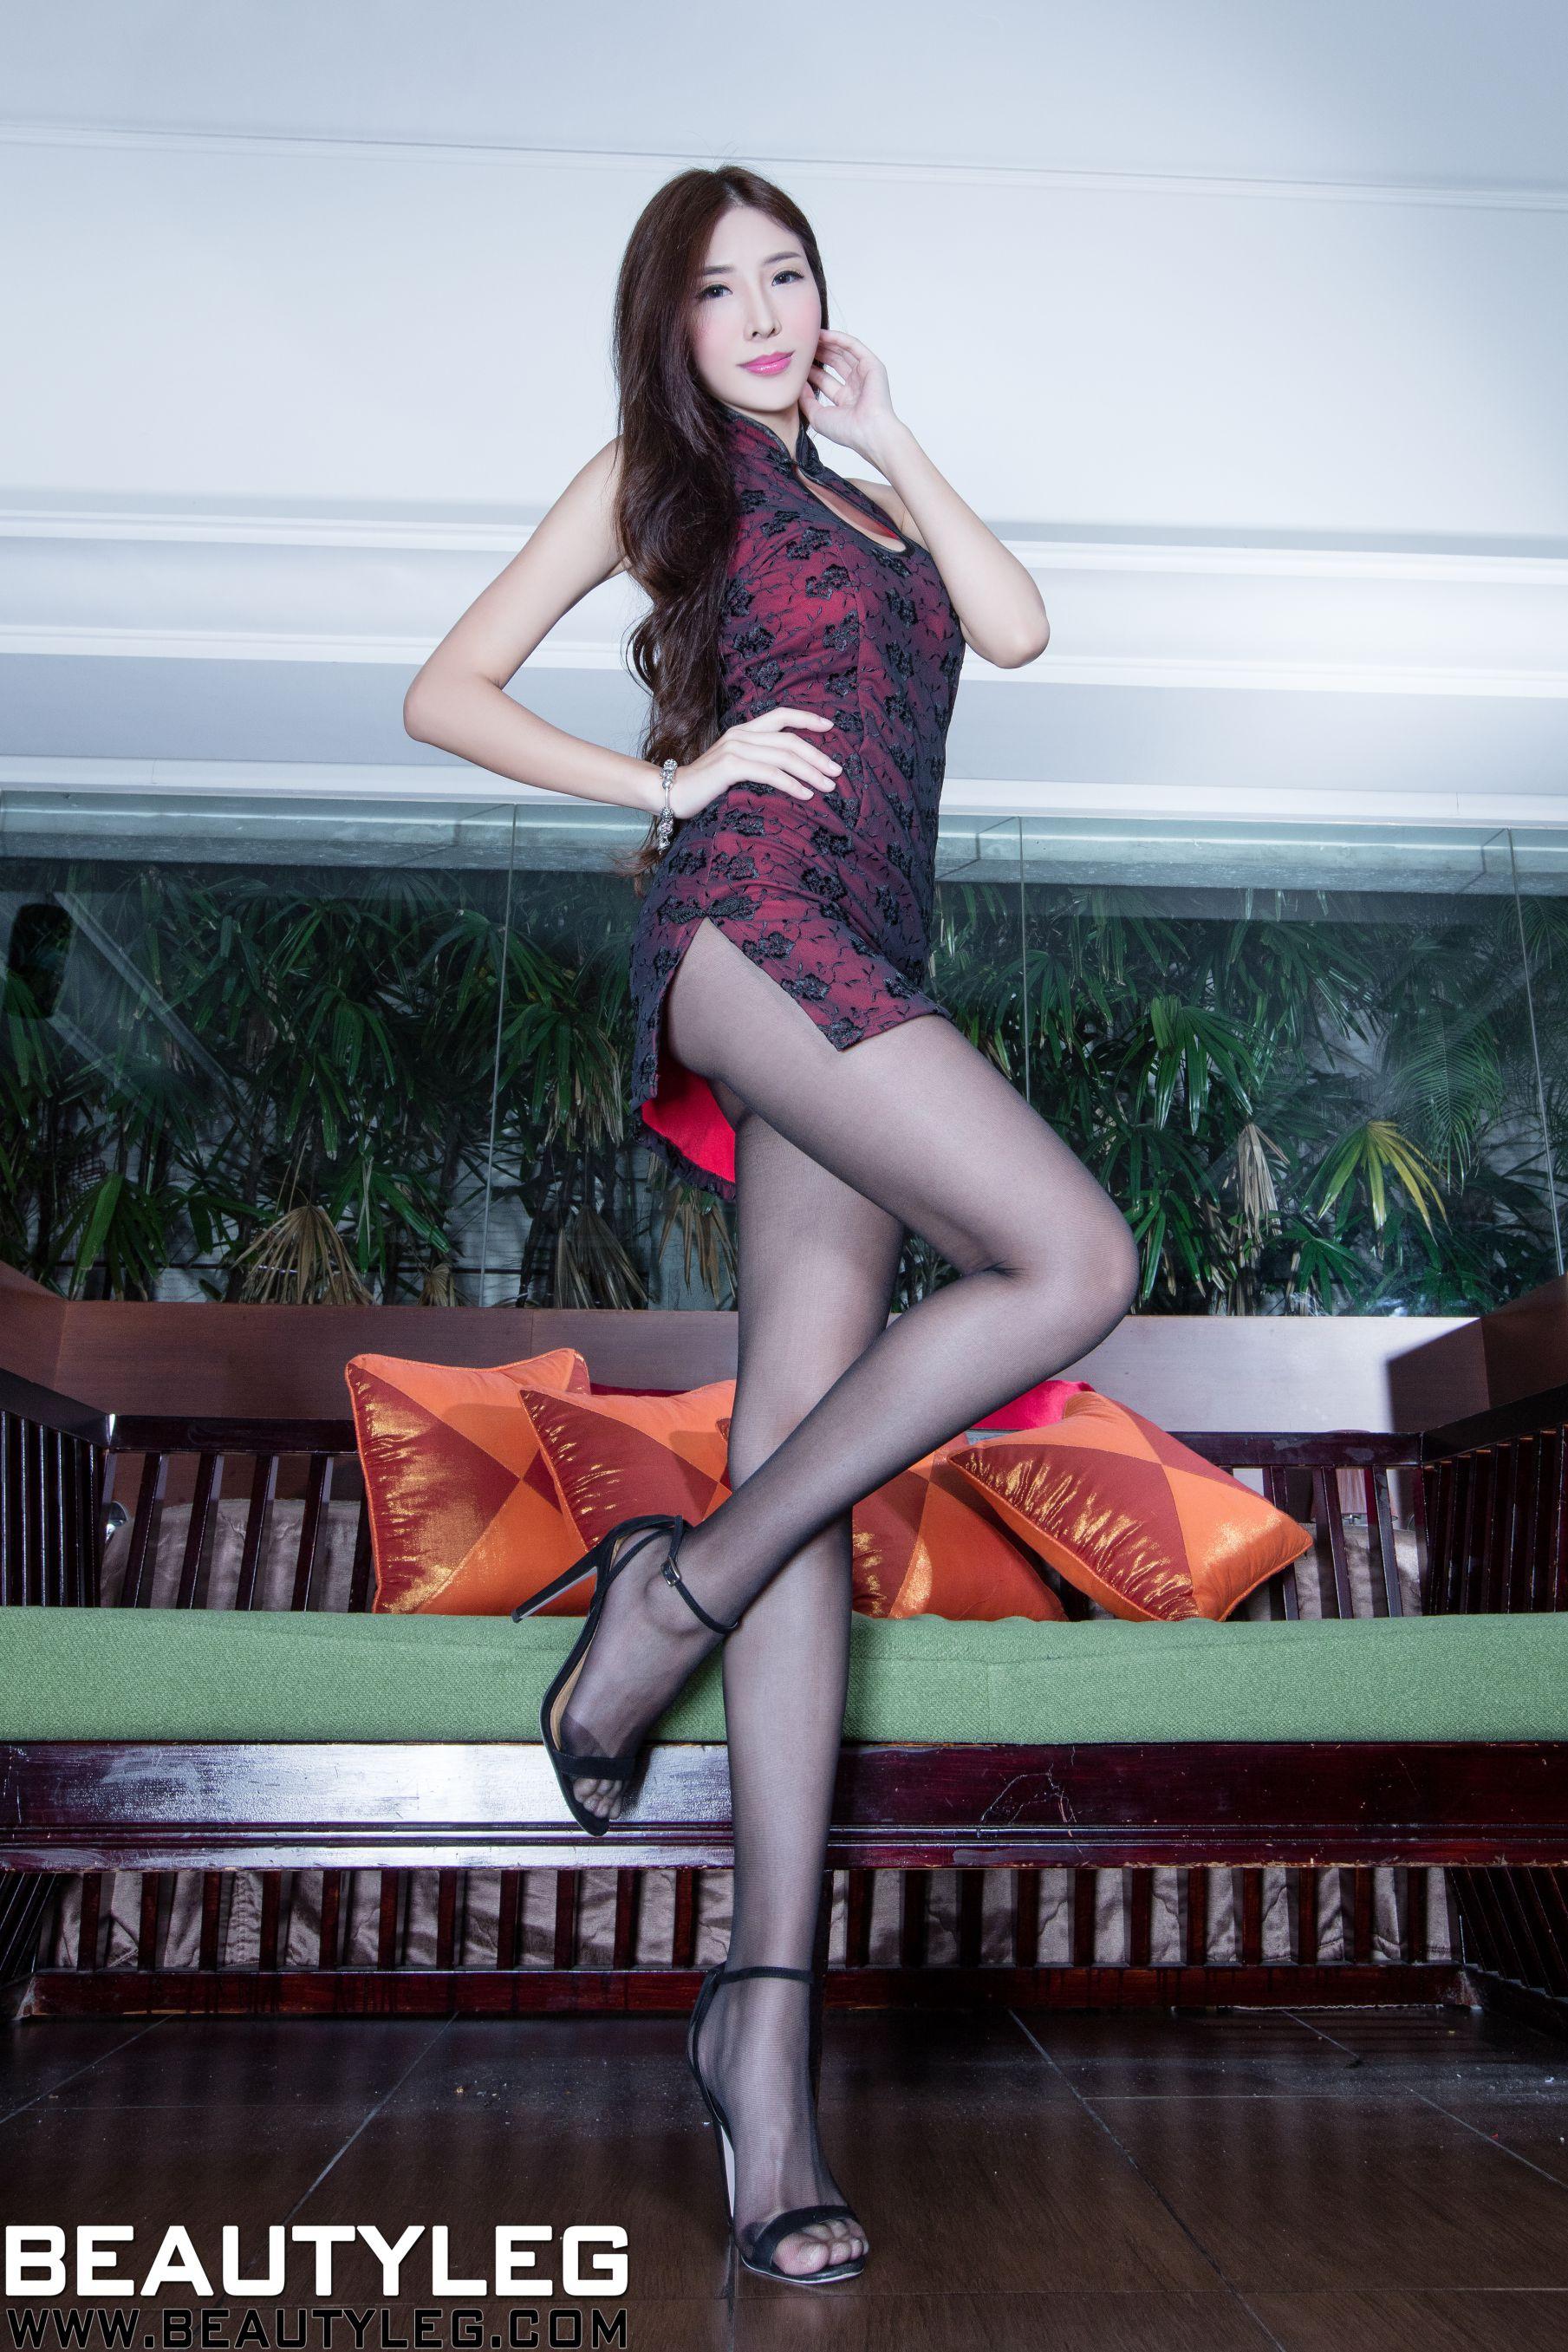 VOL.315 [Beautyleg]高跟凉鞋长腿美女:李小星(Beautyleg腿模Xin)高品质写真套图(48P)